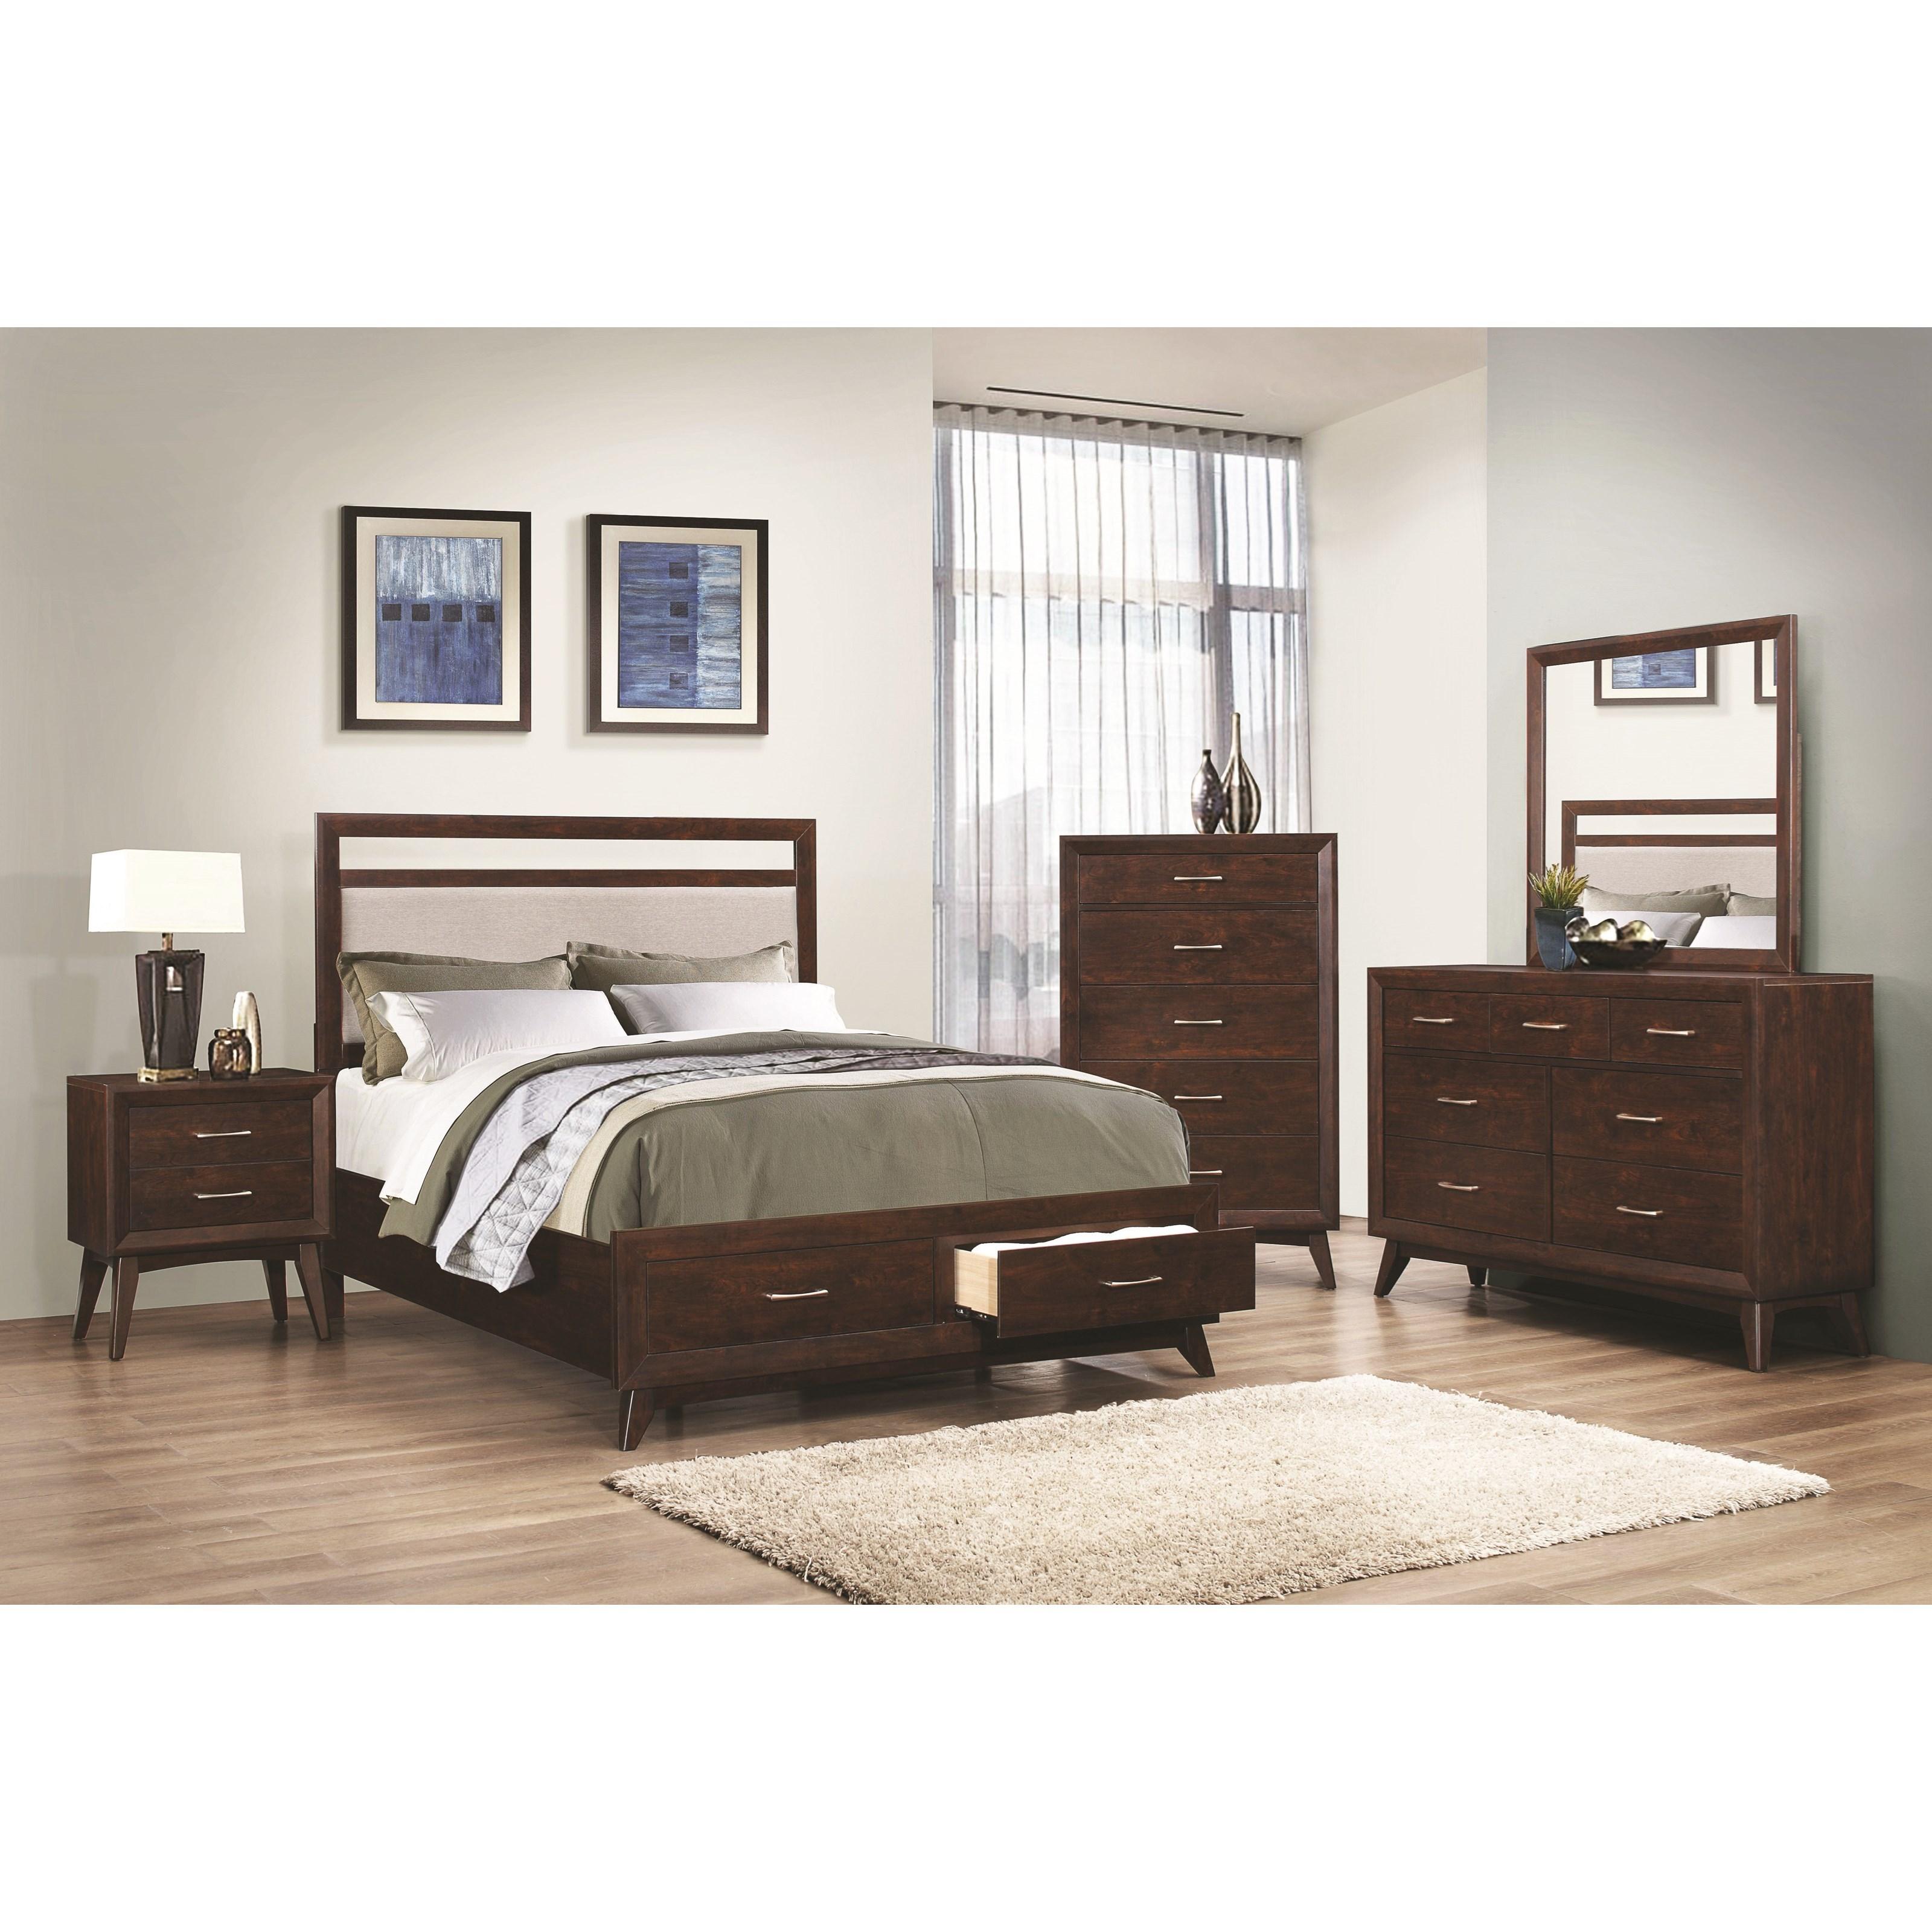 Coaster Carrington King Bedroom Group - Item Number: 205040 K Bedroom Group